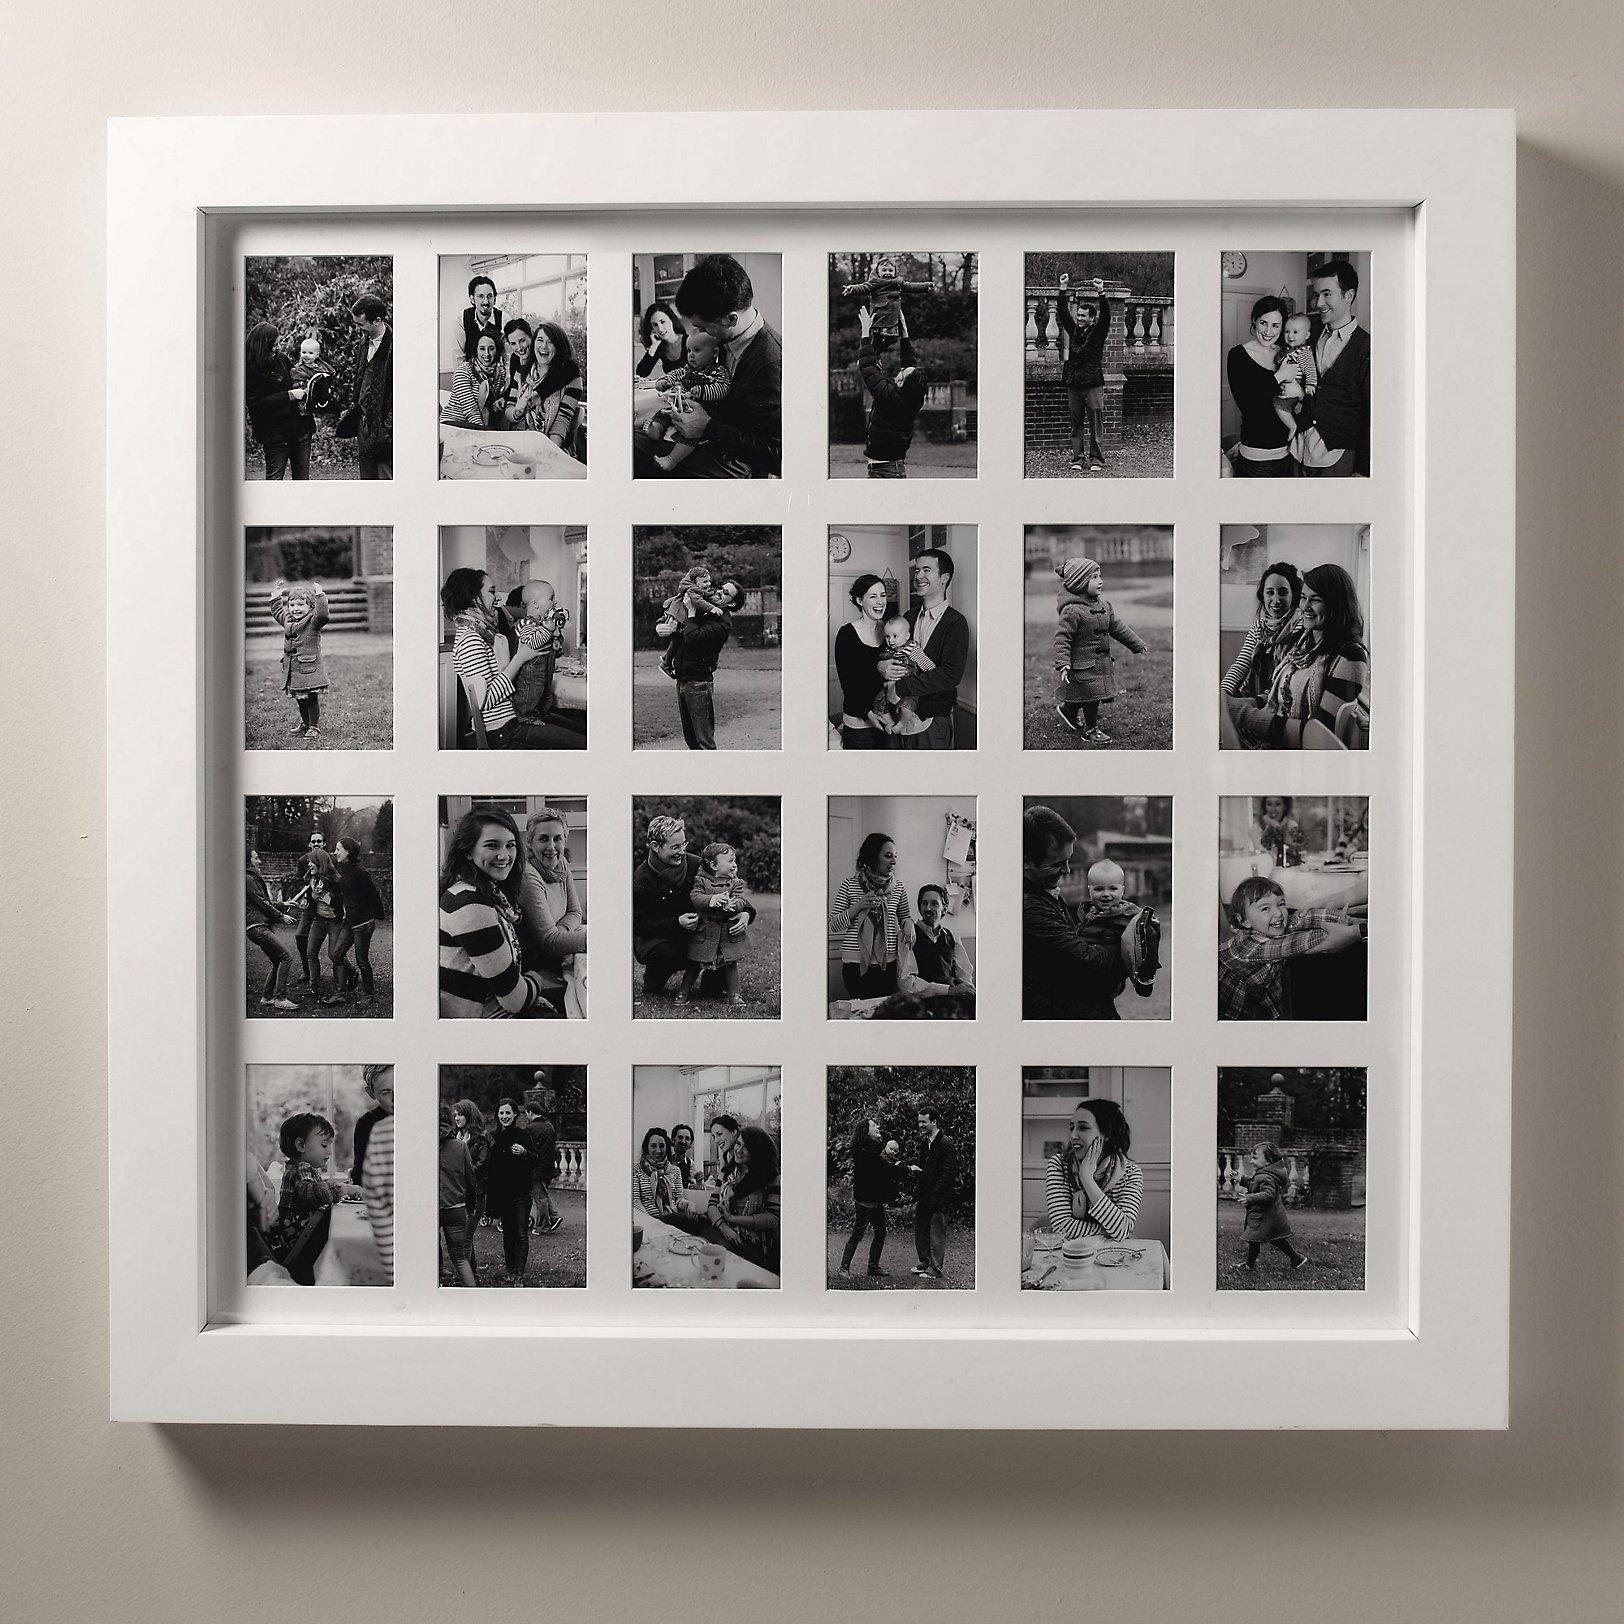 Berühmt Picture Frames Memories Galerie - Bilderrahmen Ideen ...